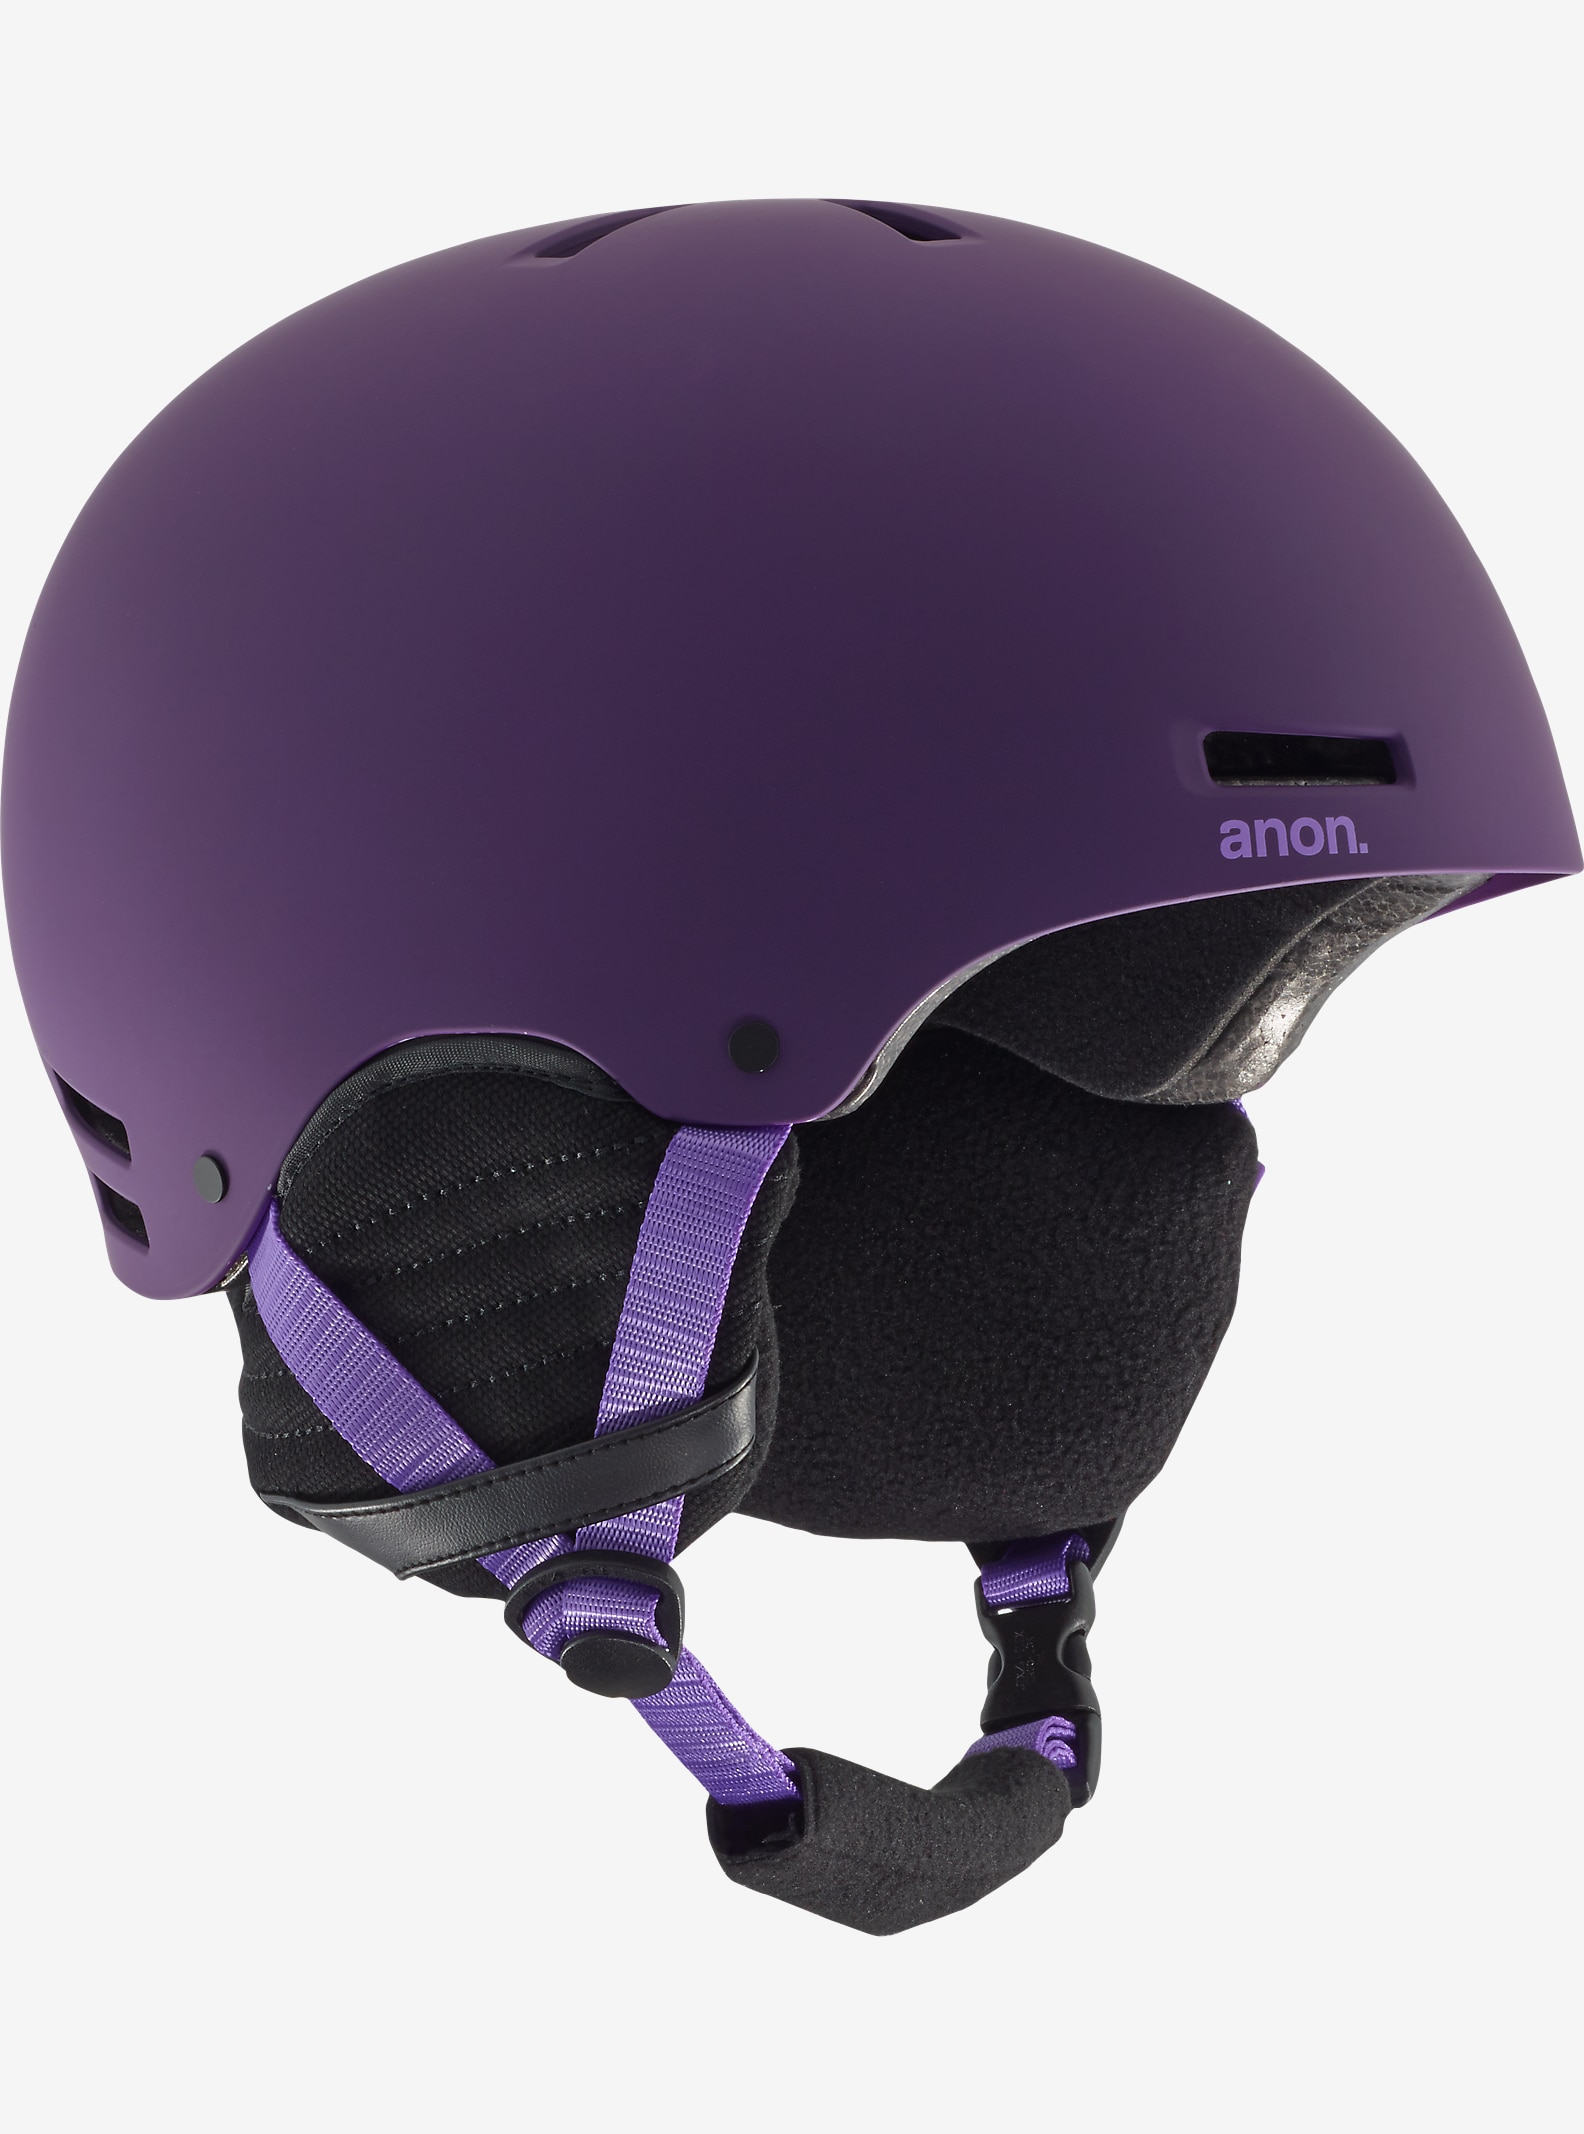 anon. Greta Helmet shown in Imperial Purple